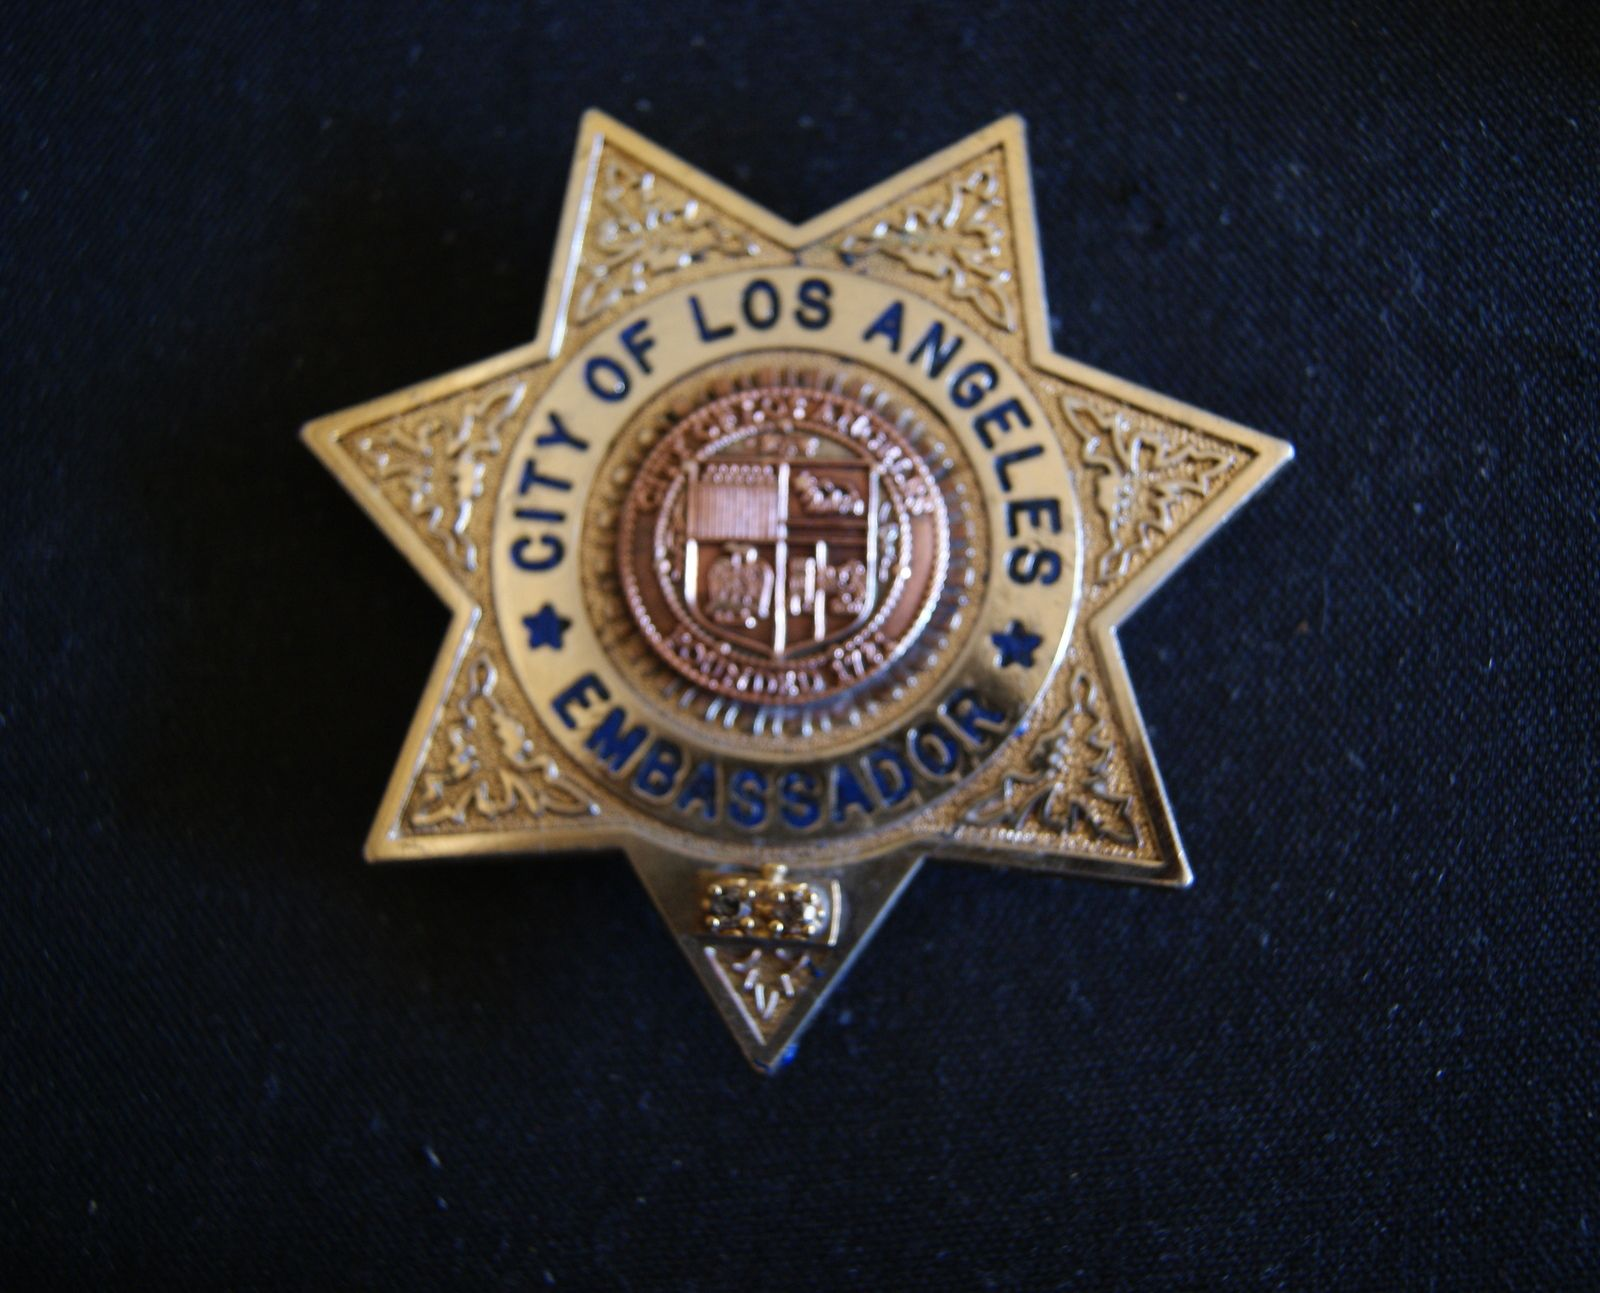 City of los angeles police badge police badge ambassador